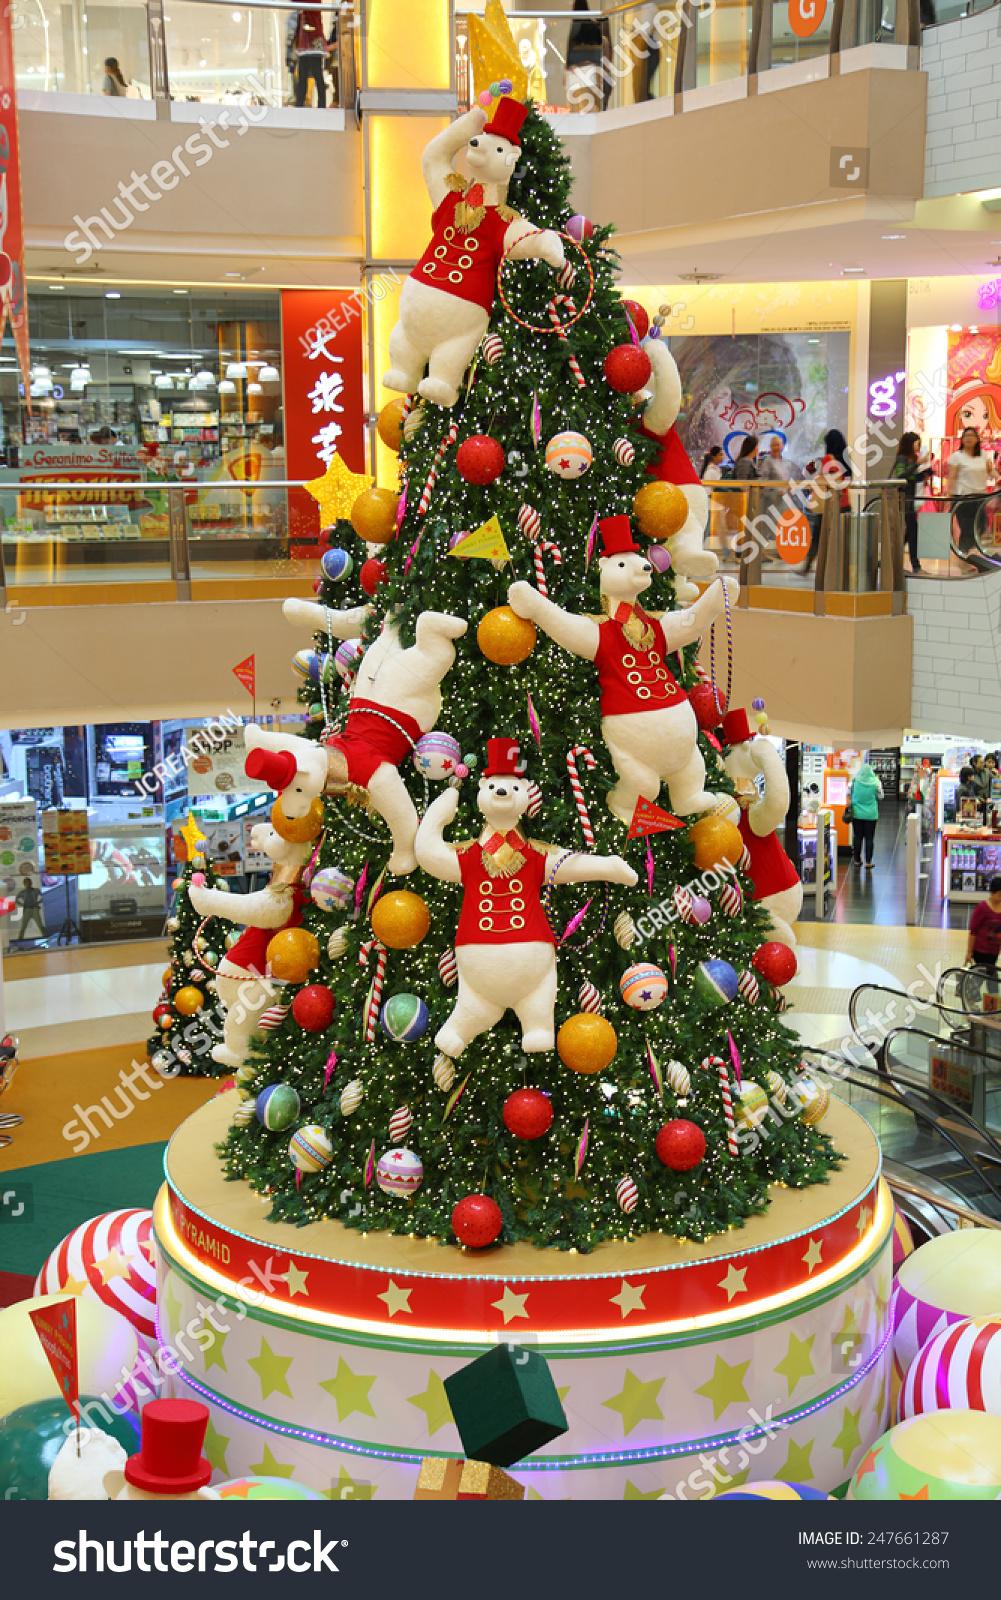 Pyramid christmas ornament - Selangor Malaysia December 17 The Beautiful Christmas Decorations At Sunway Pyramid Shopping Mall